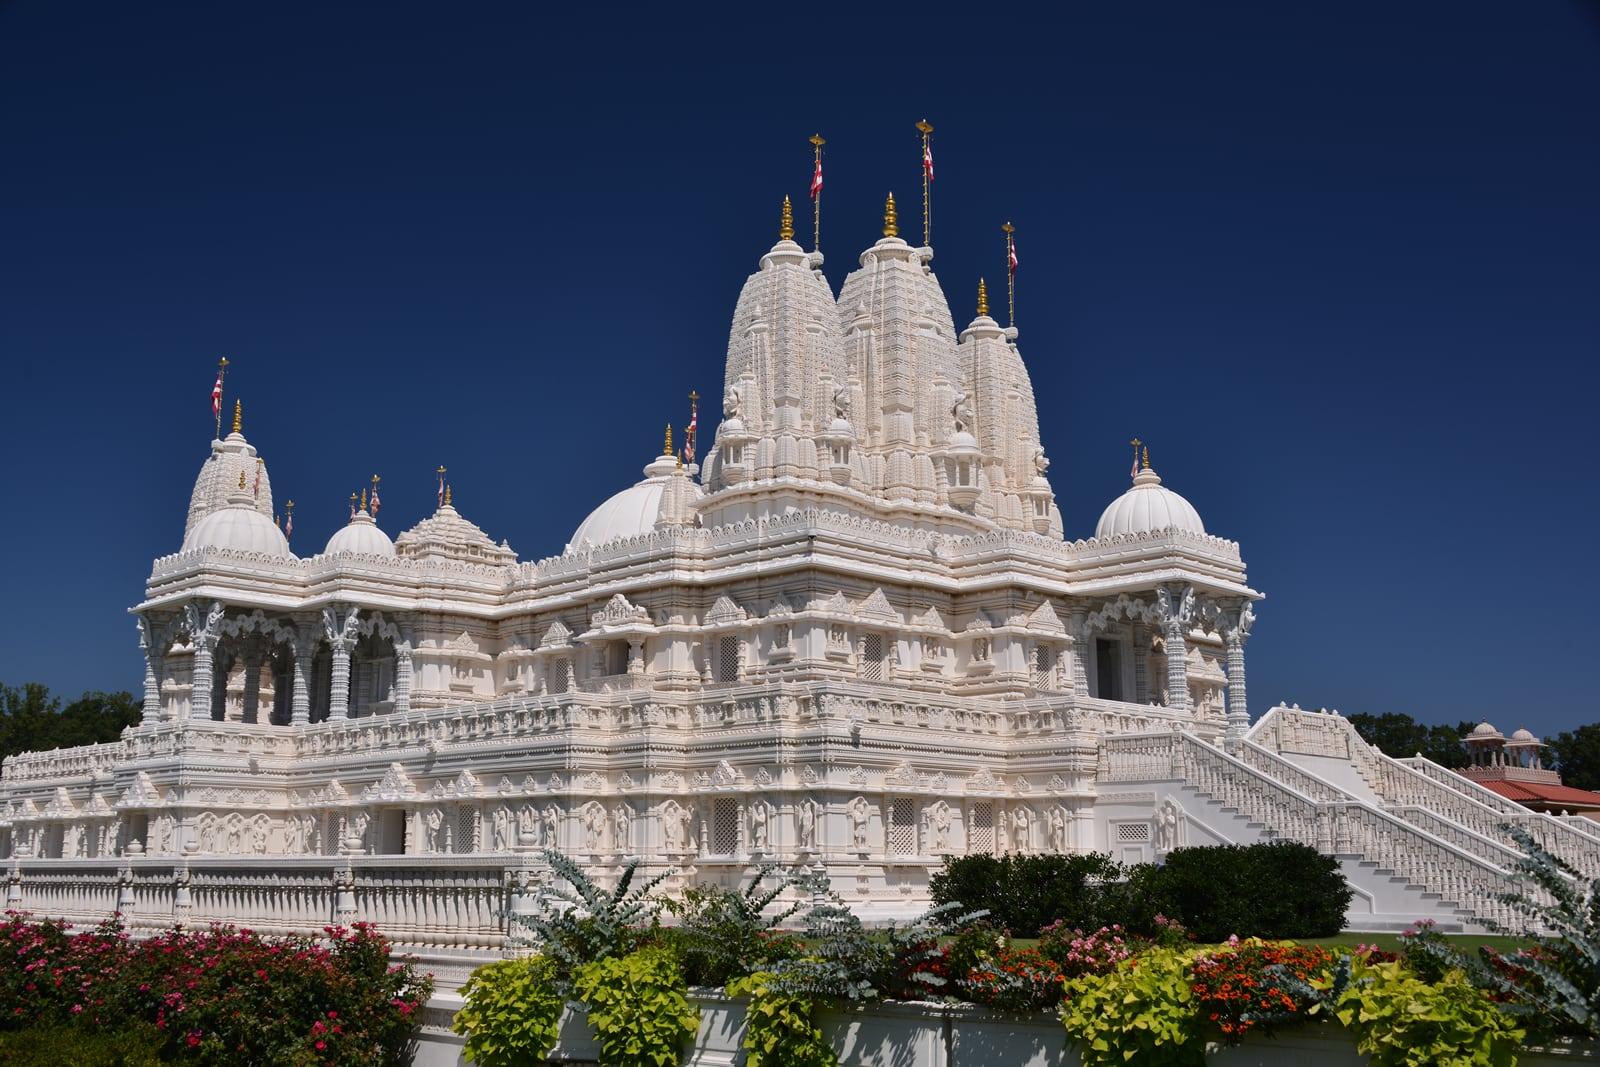 Bienvenue au BAPS Shri Swaminarayan Mandir